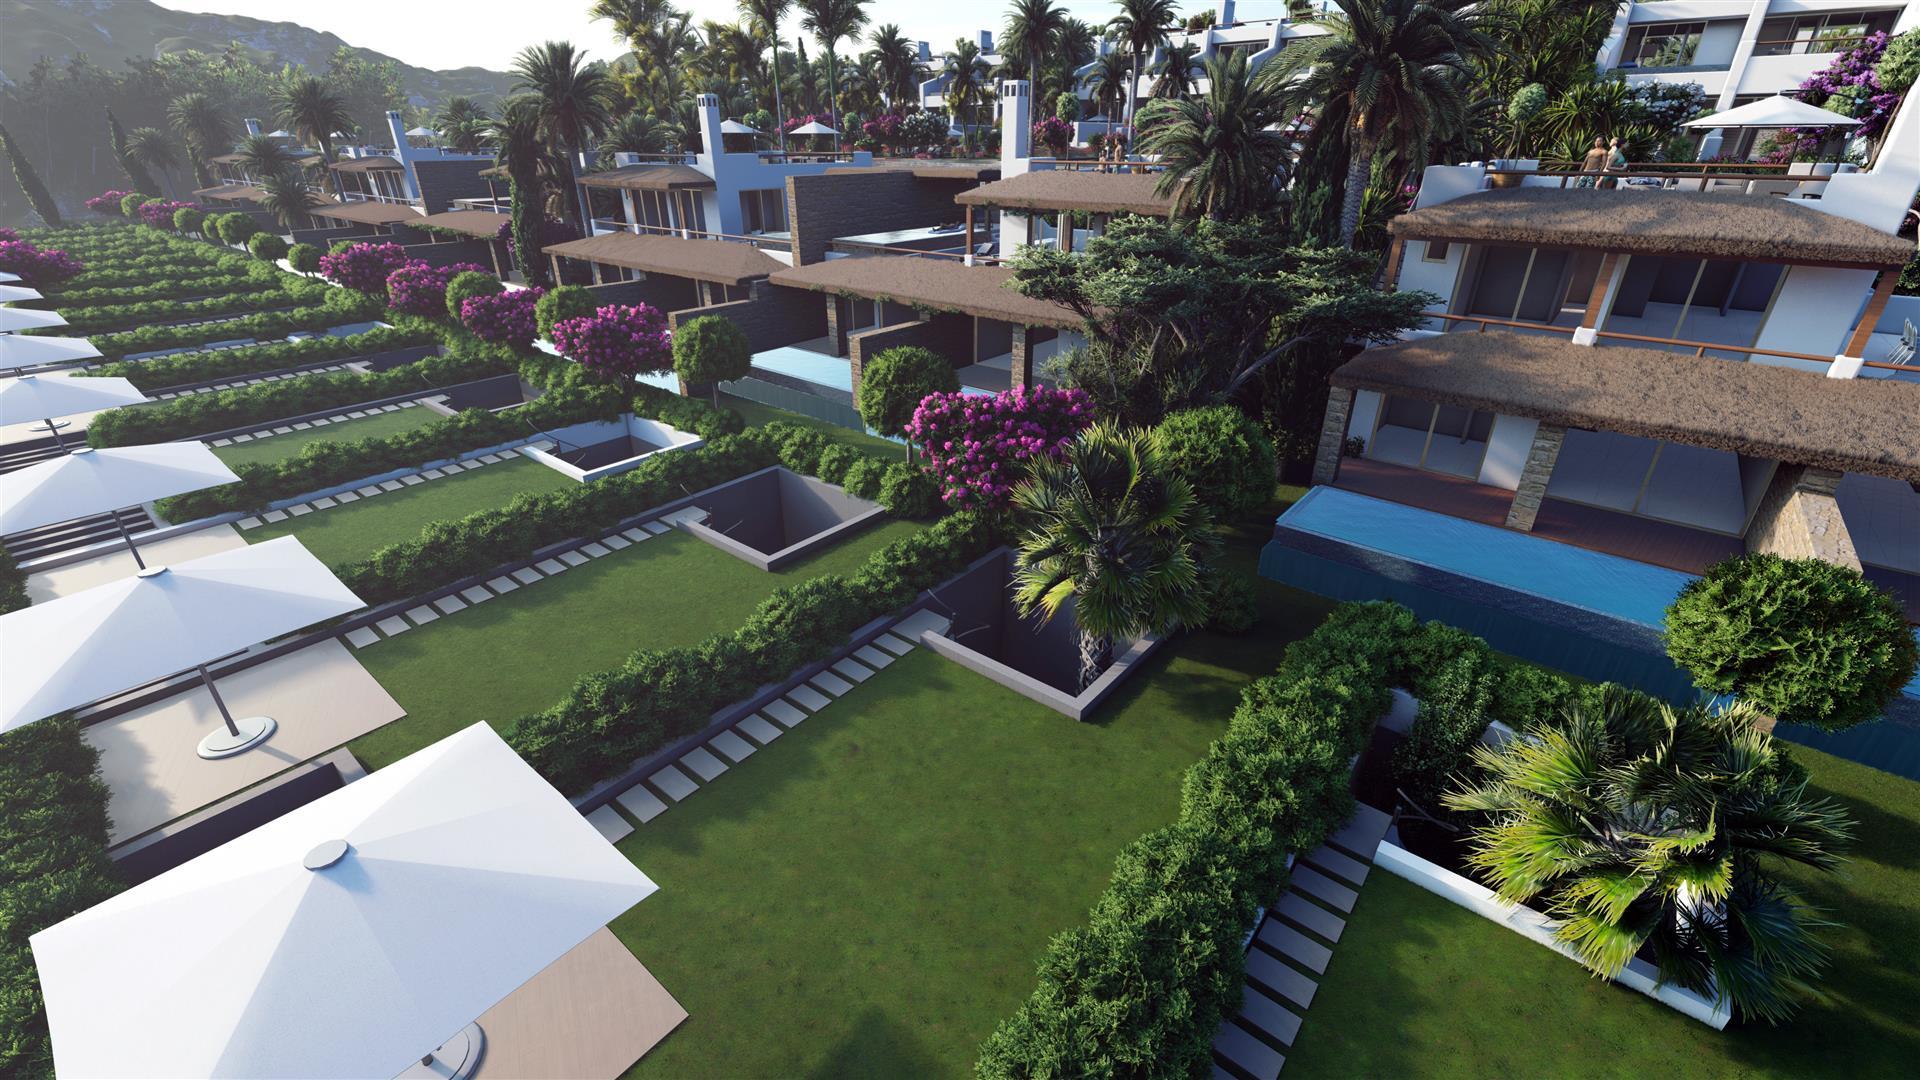 Luxury beach-front resort-style development